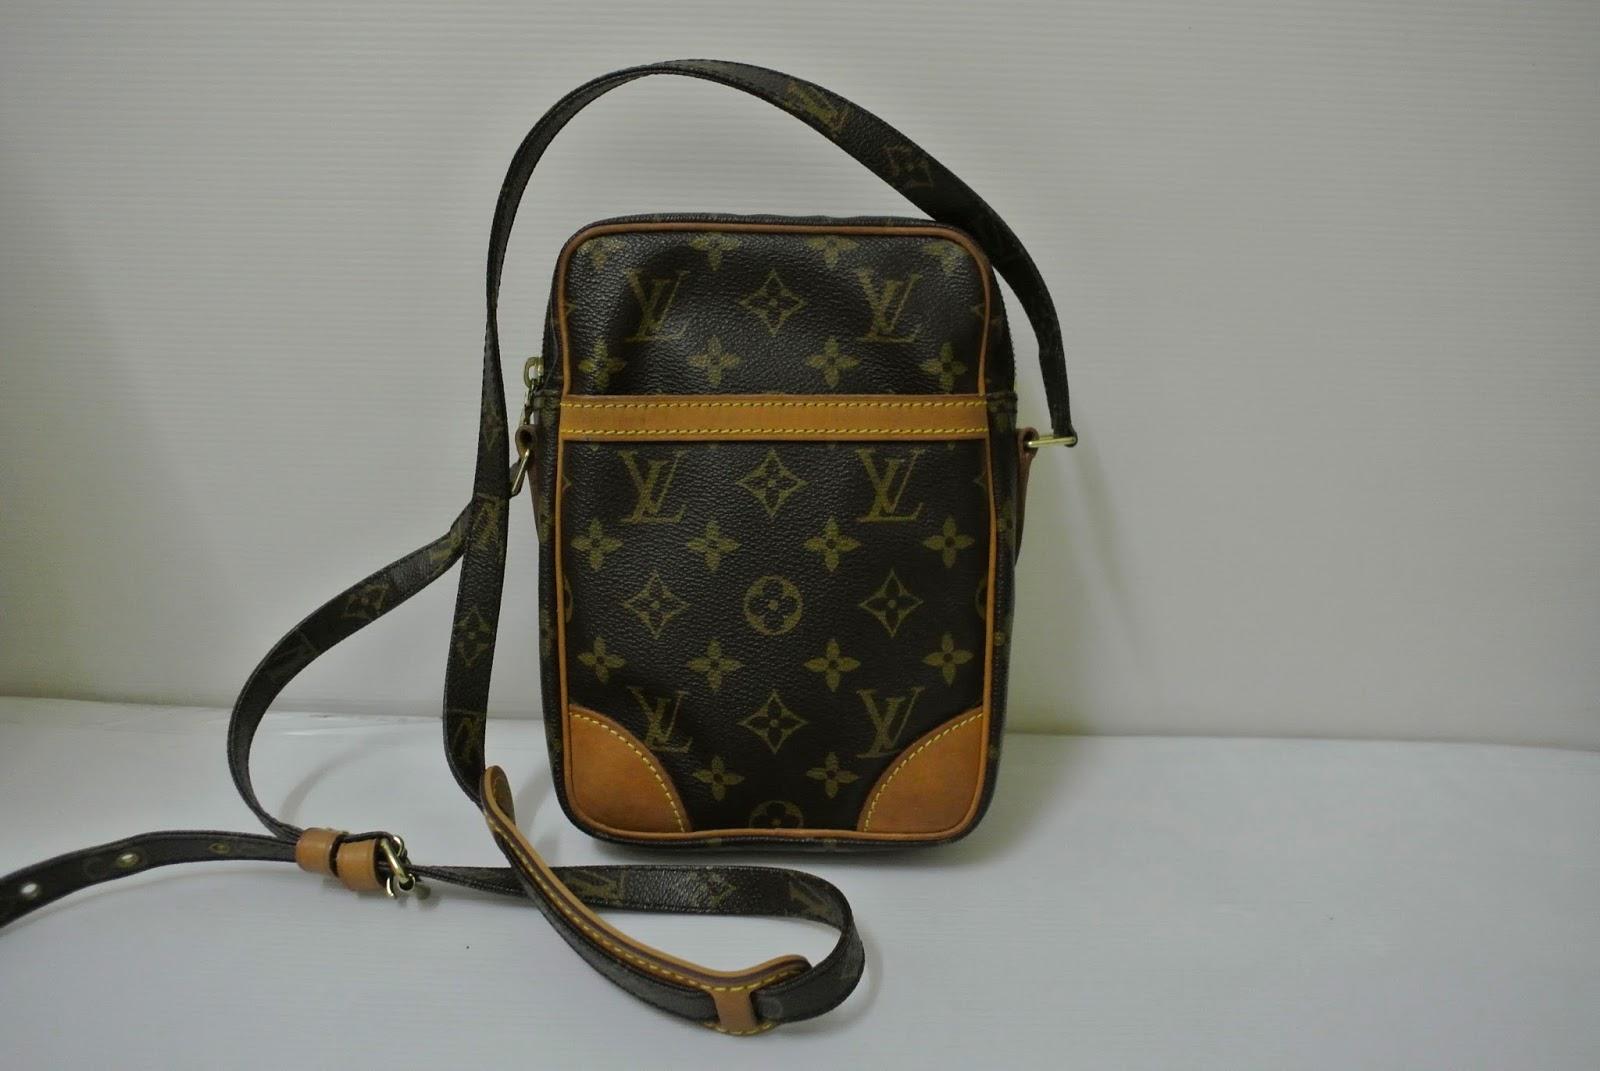 Unique Louis Vuitton Bag With Sling Bag High Quality